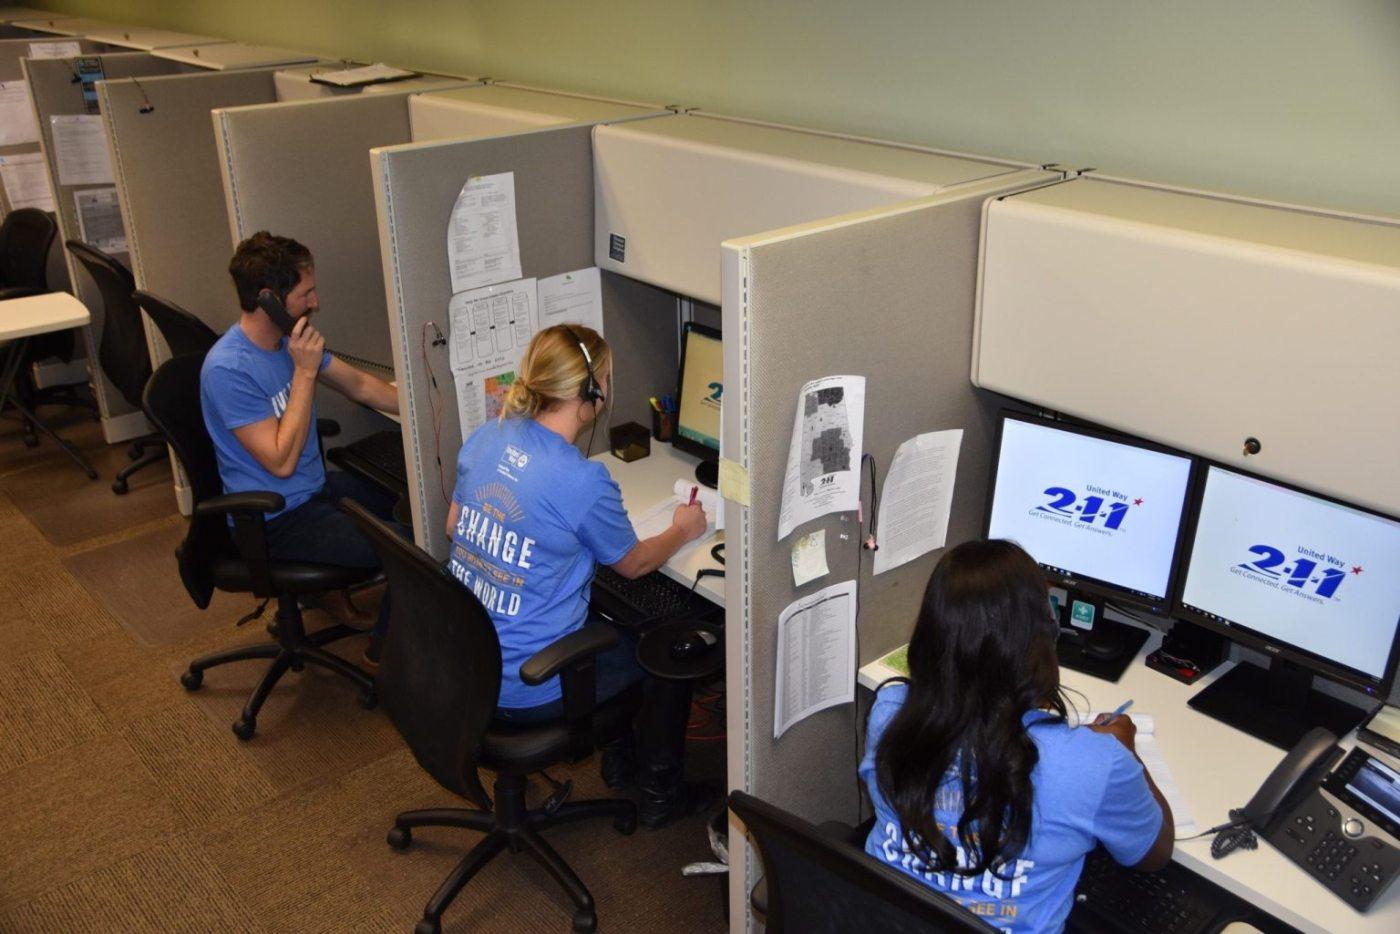 2-1-1 UWCA, 2-1-1 day, call operators answering phones